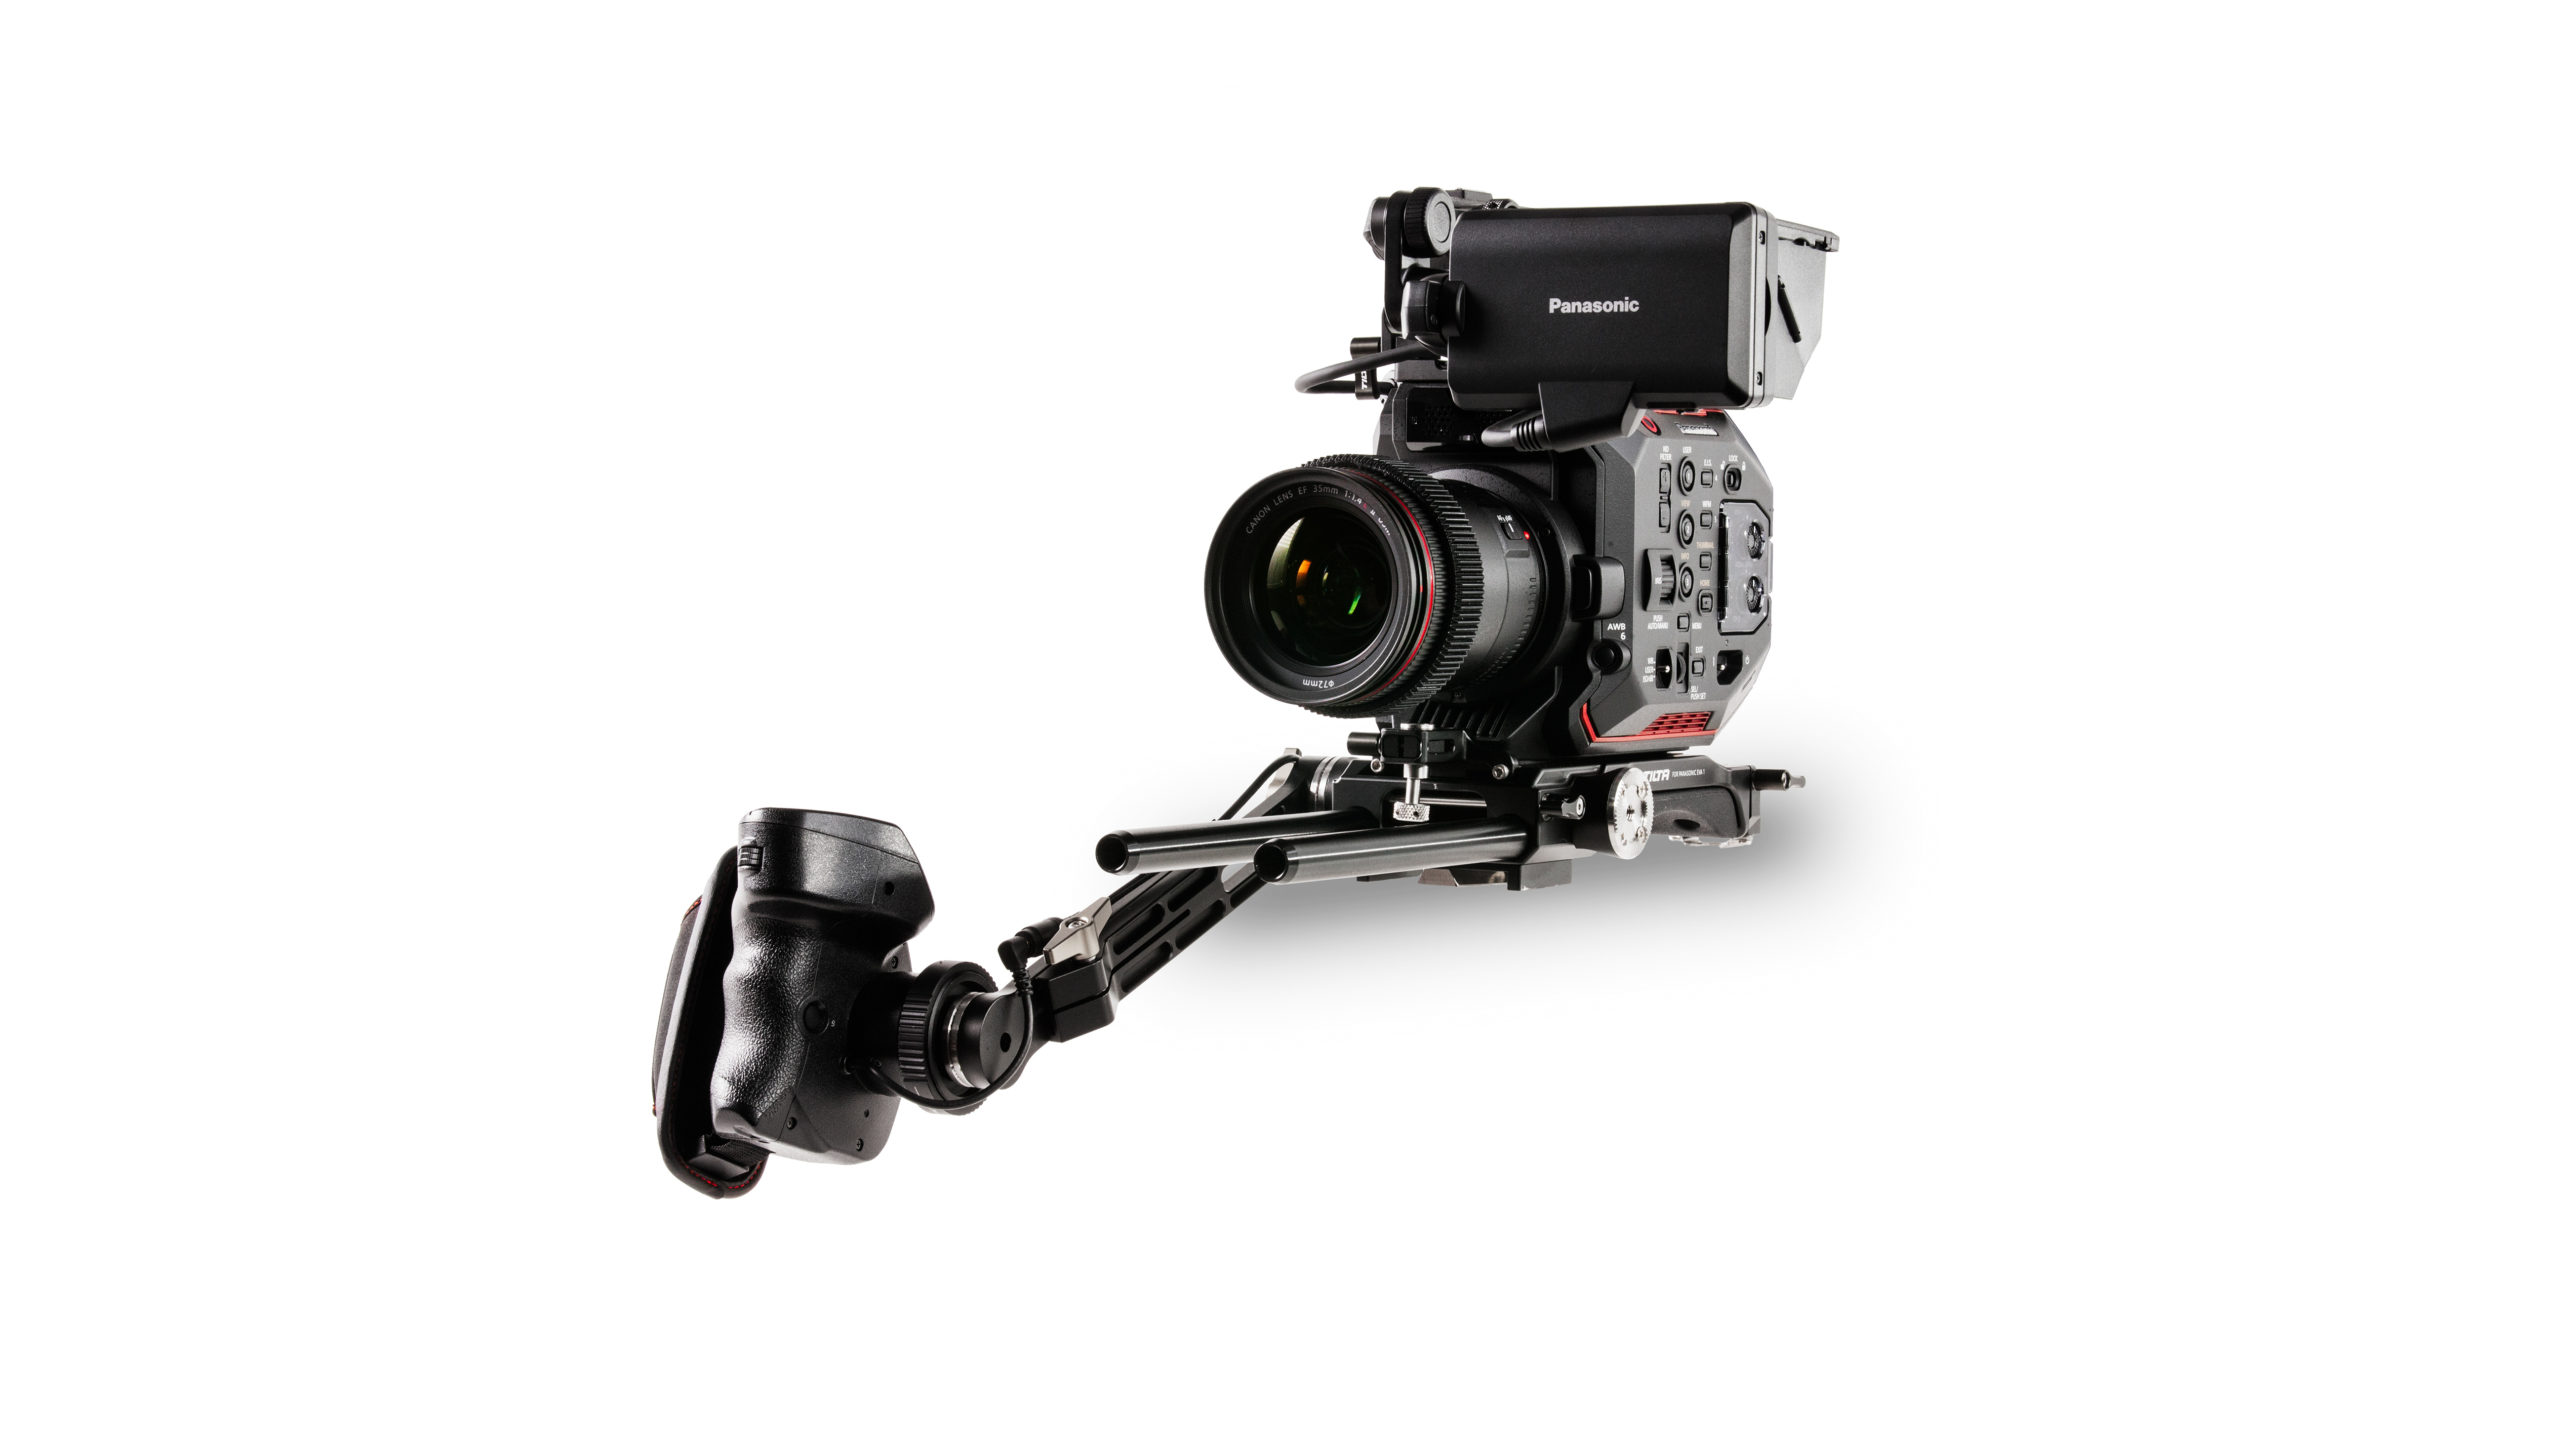 Camera Cage for Panasonic EVA1 - No Battery Plate (Open Box)